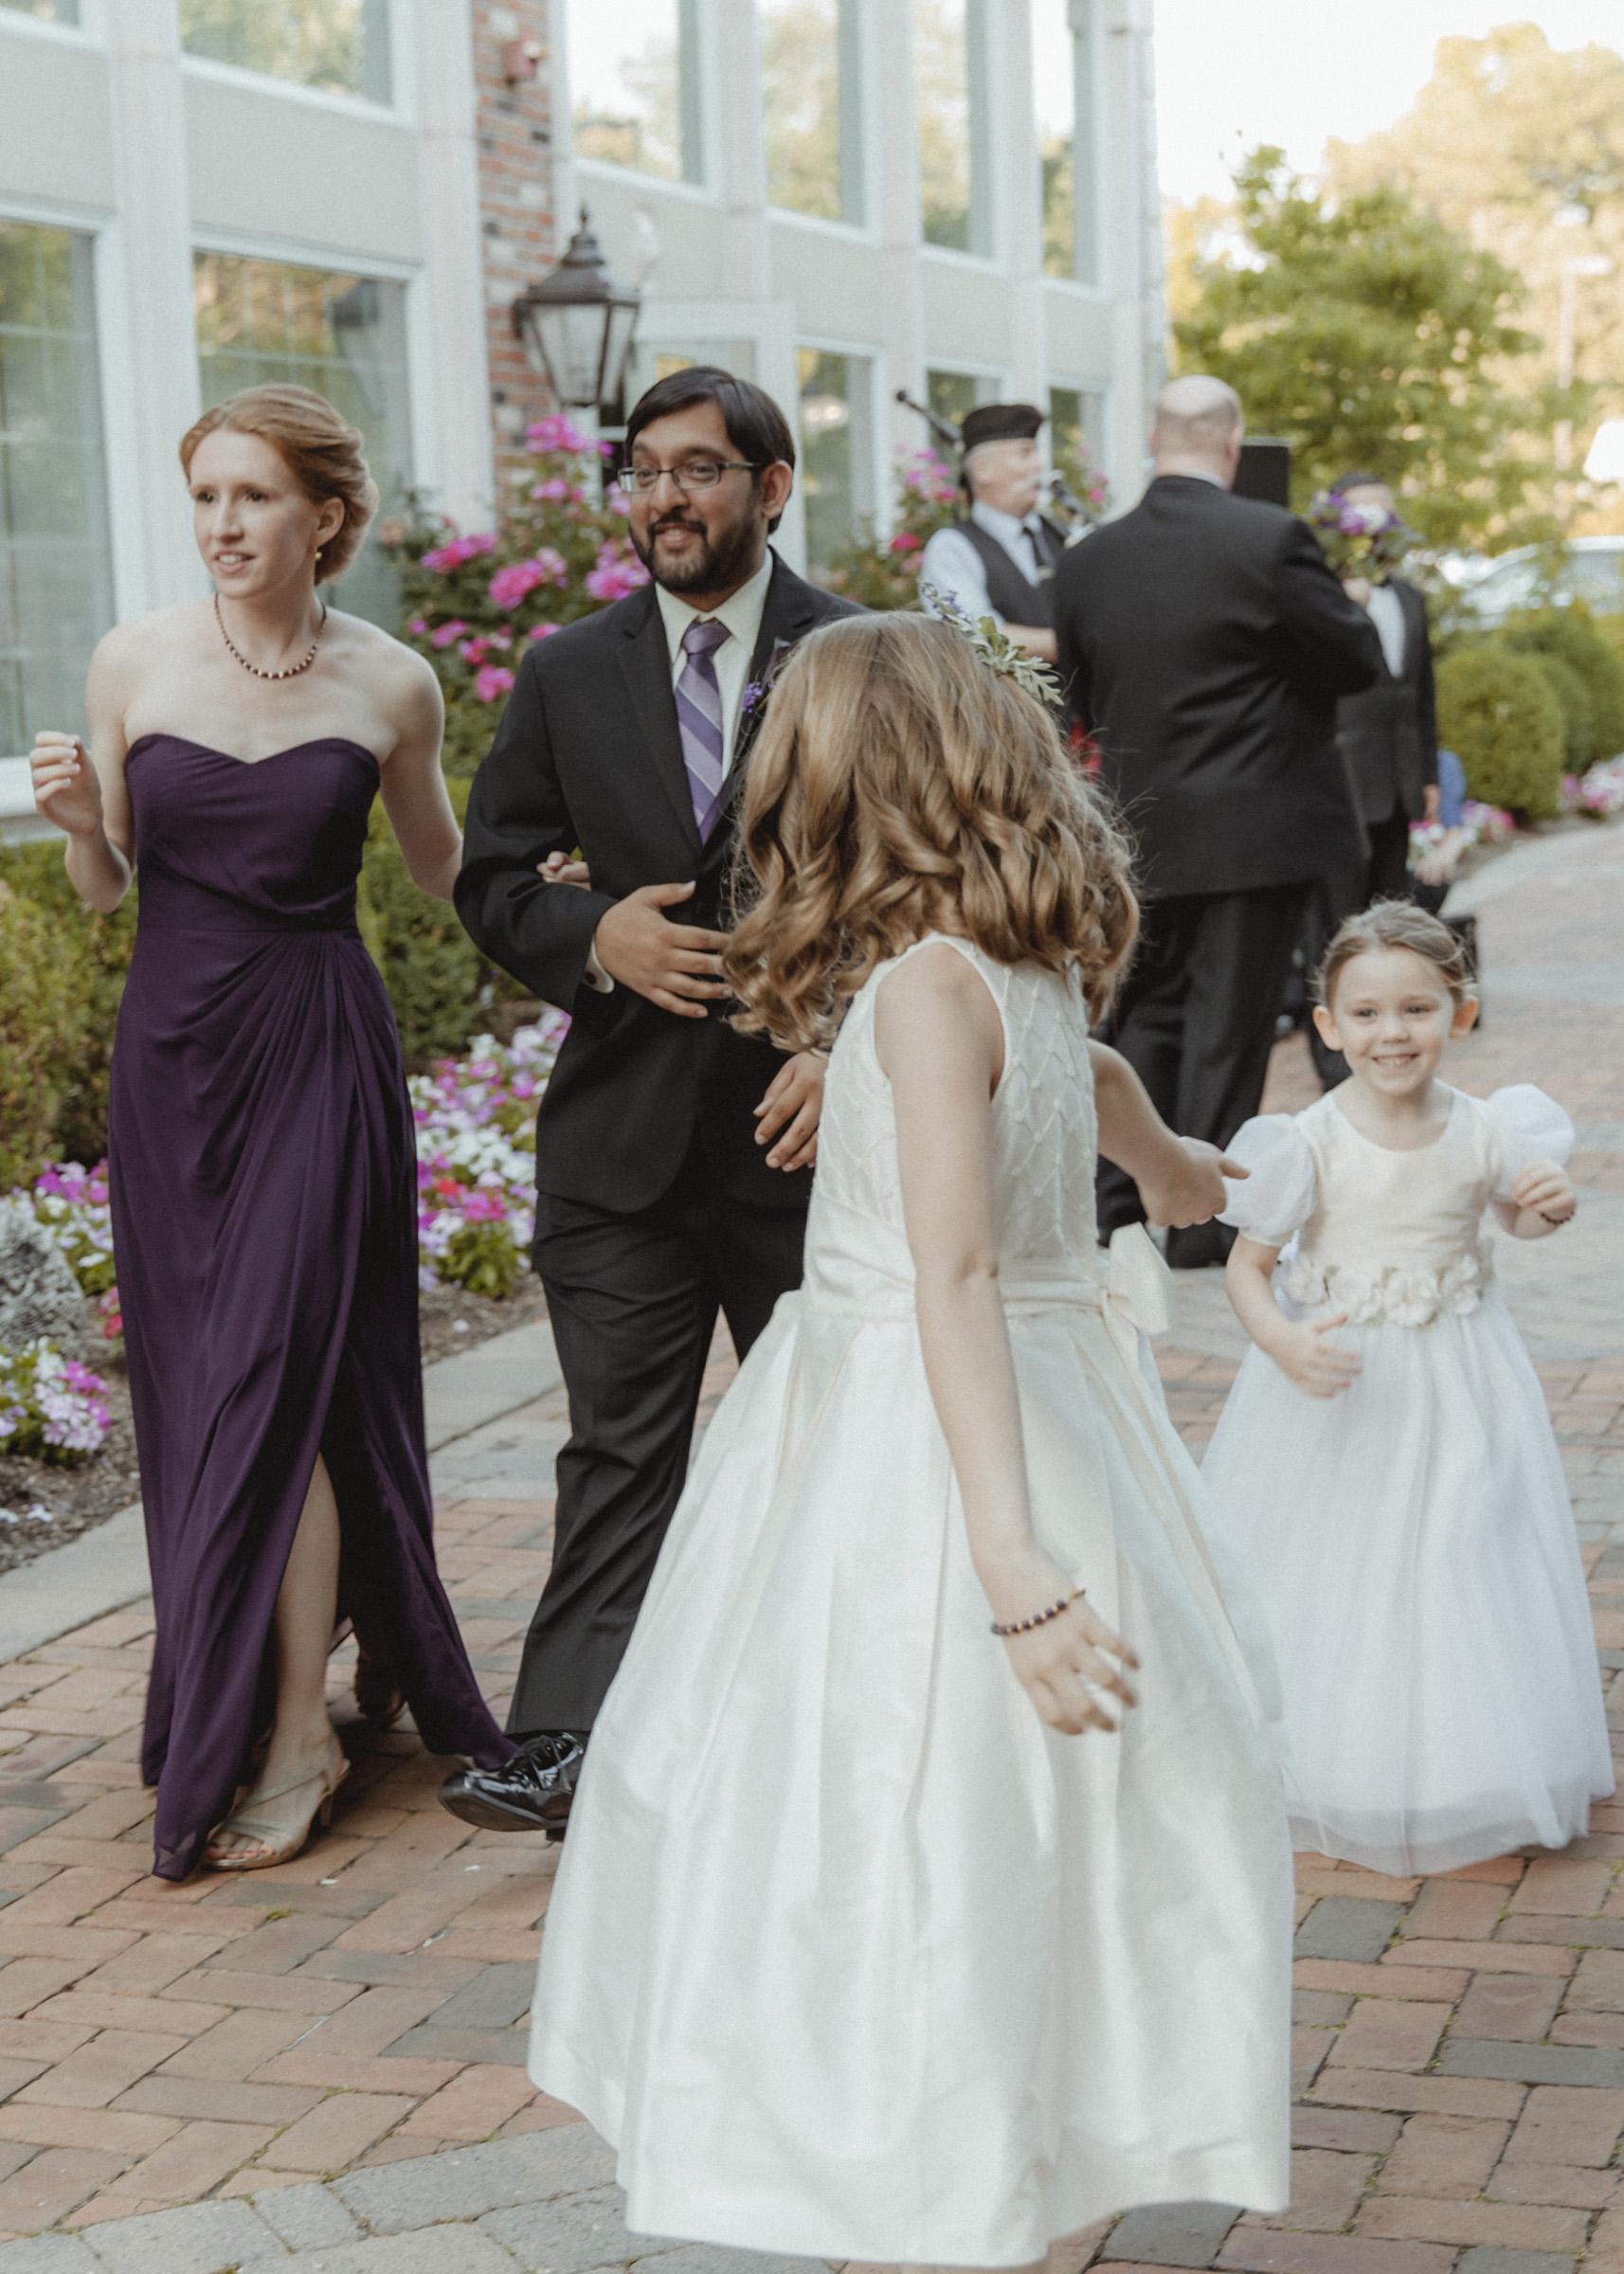 Flowergirls play together - Estate at Florentine Gardens wedding - Hudson Valley Wedding - Kelsey & Anish's wedding - Amy Sims Photography